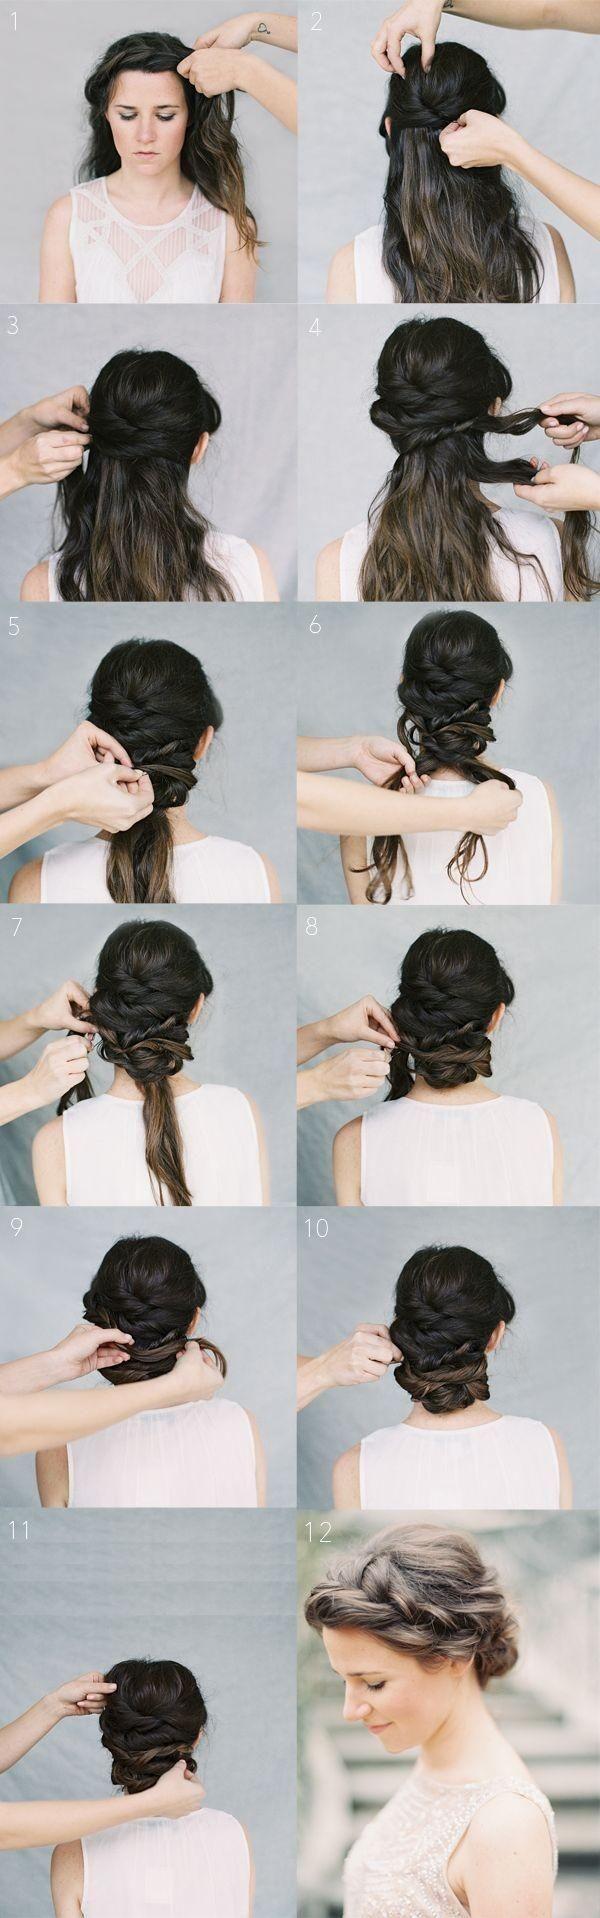 twist updo hairstyles with braids: wedding hairstyles tutorial